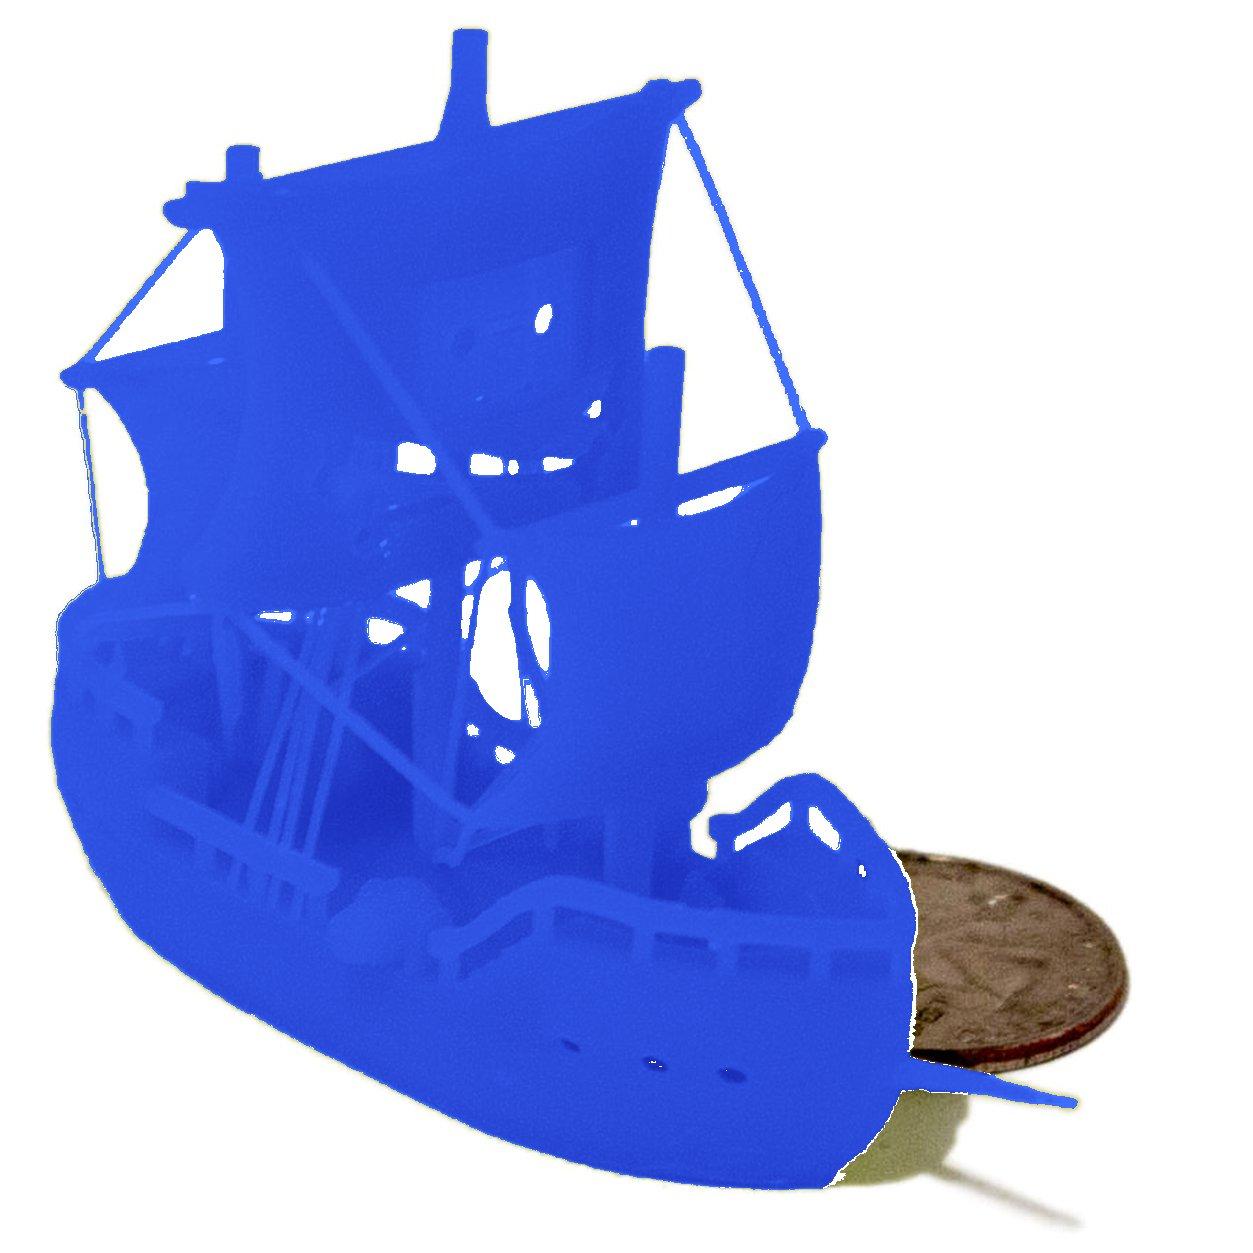 MakerJuice Blue G+ UV 3D Plastic Printing Resin for SLA and DLP Printers (one 500 mL bottle).